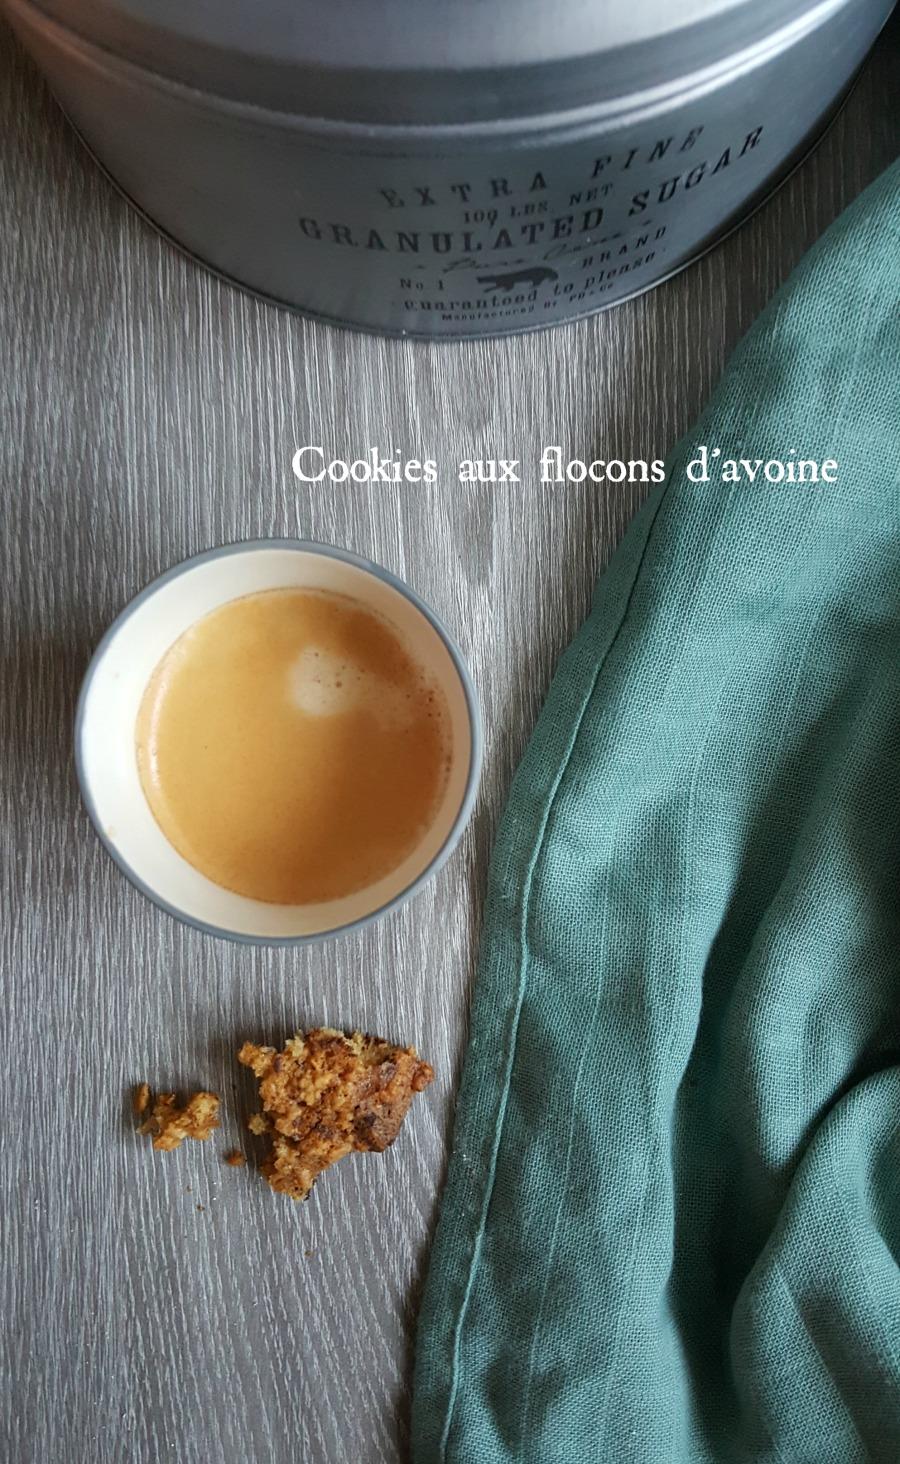 cookiesfa3